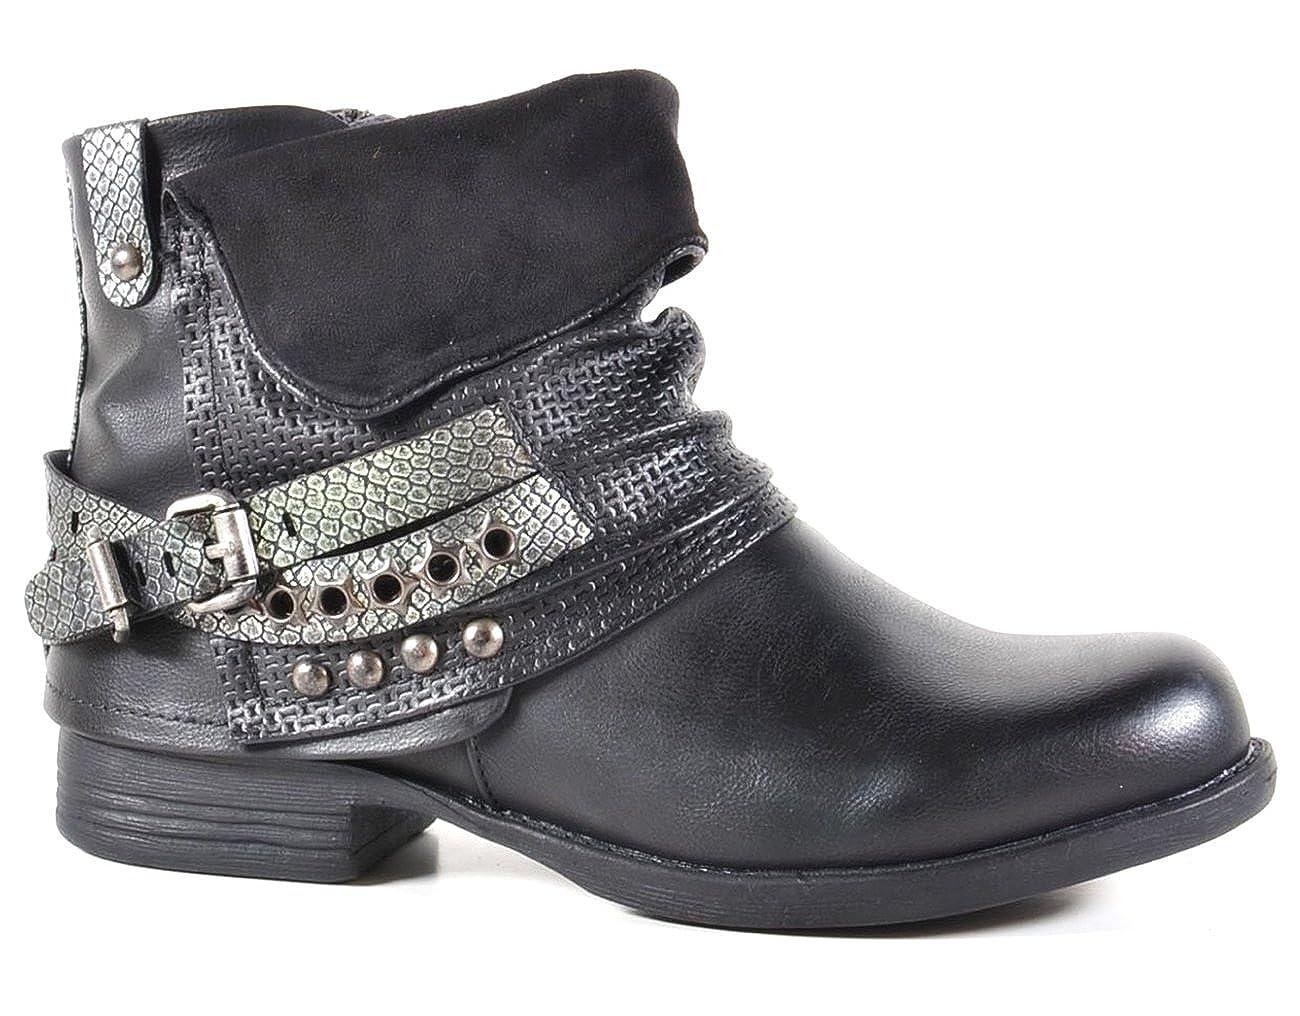 Damen Stiefeletten Biker Boots Nieten Schnallen Knöchelhohe Stiefel Leder- Optik QBZ2  Amazon.de  Schuhe   Handtaschen 3b682b3841